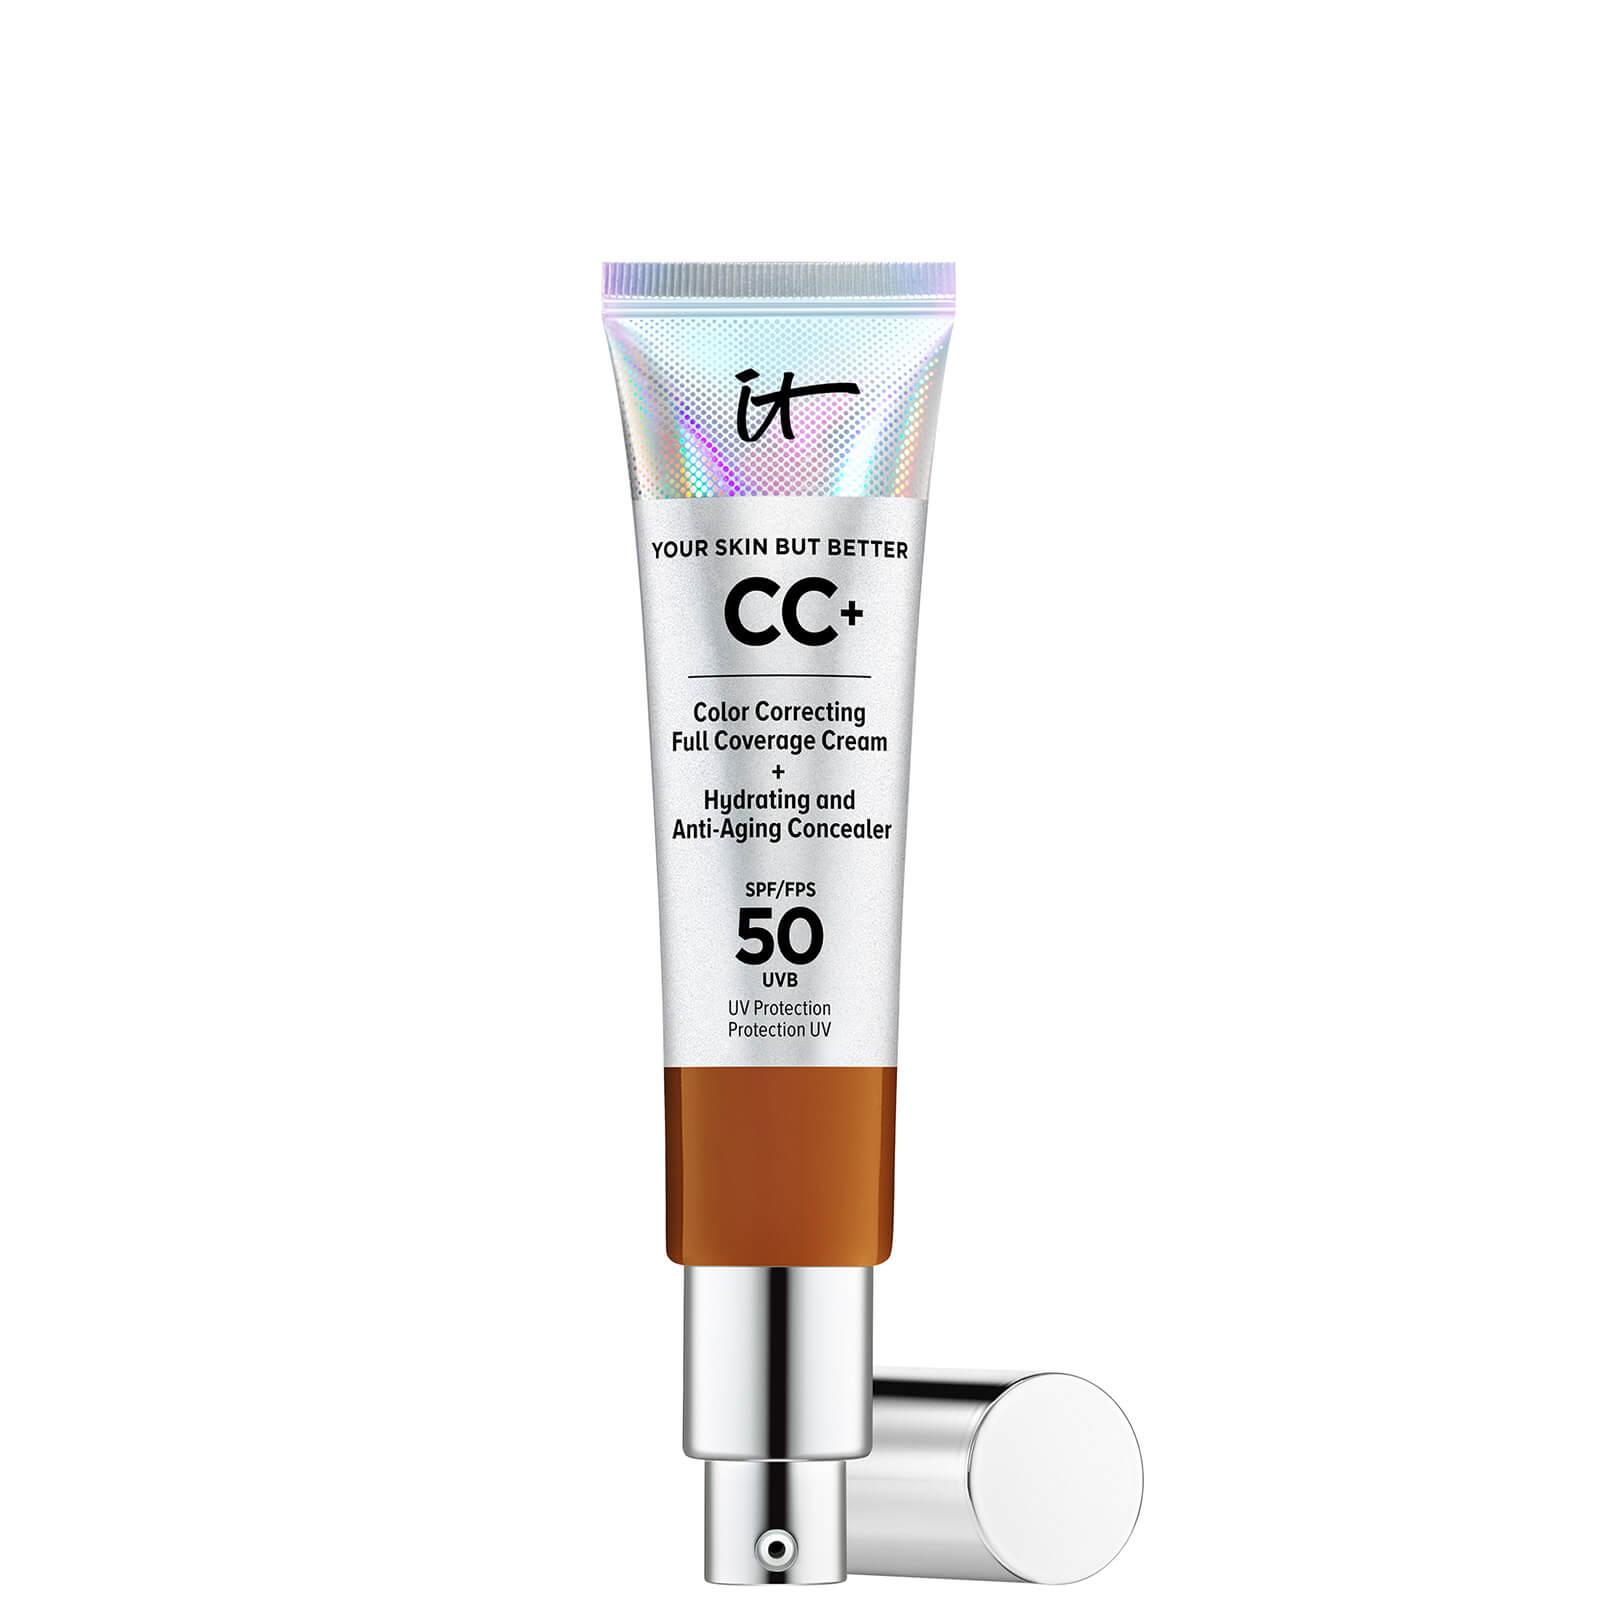 Купить IT Cosmetics Your Skin But Better CC+ Cream with SPF50 32ml (Various Shades) - Rich Honey